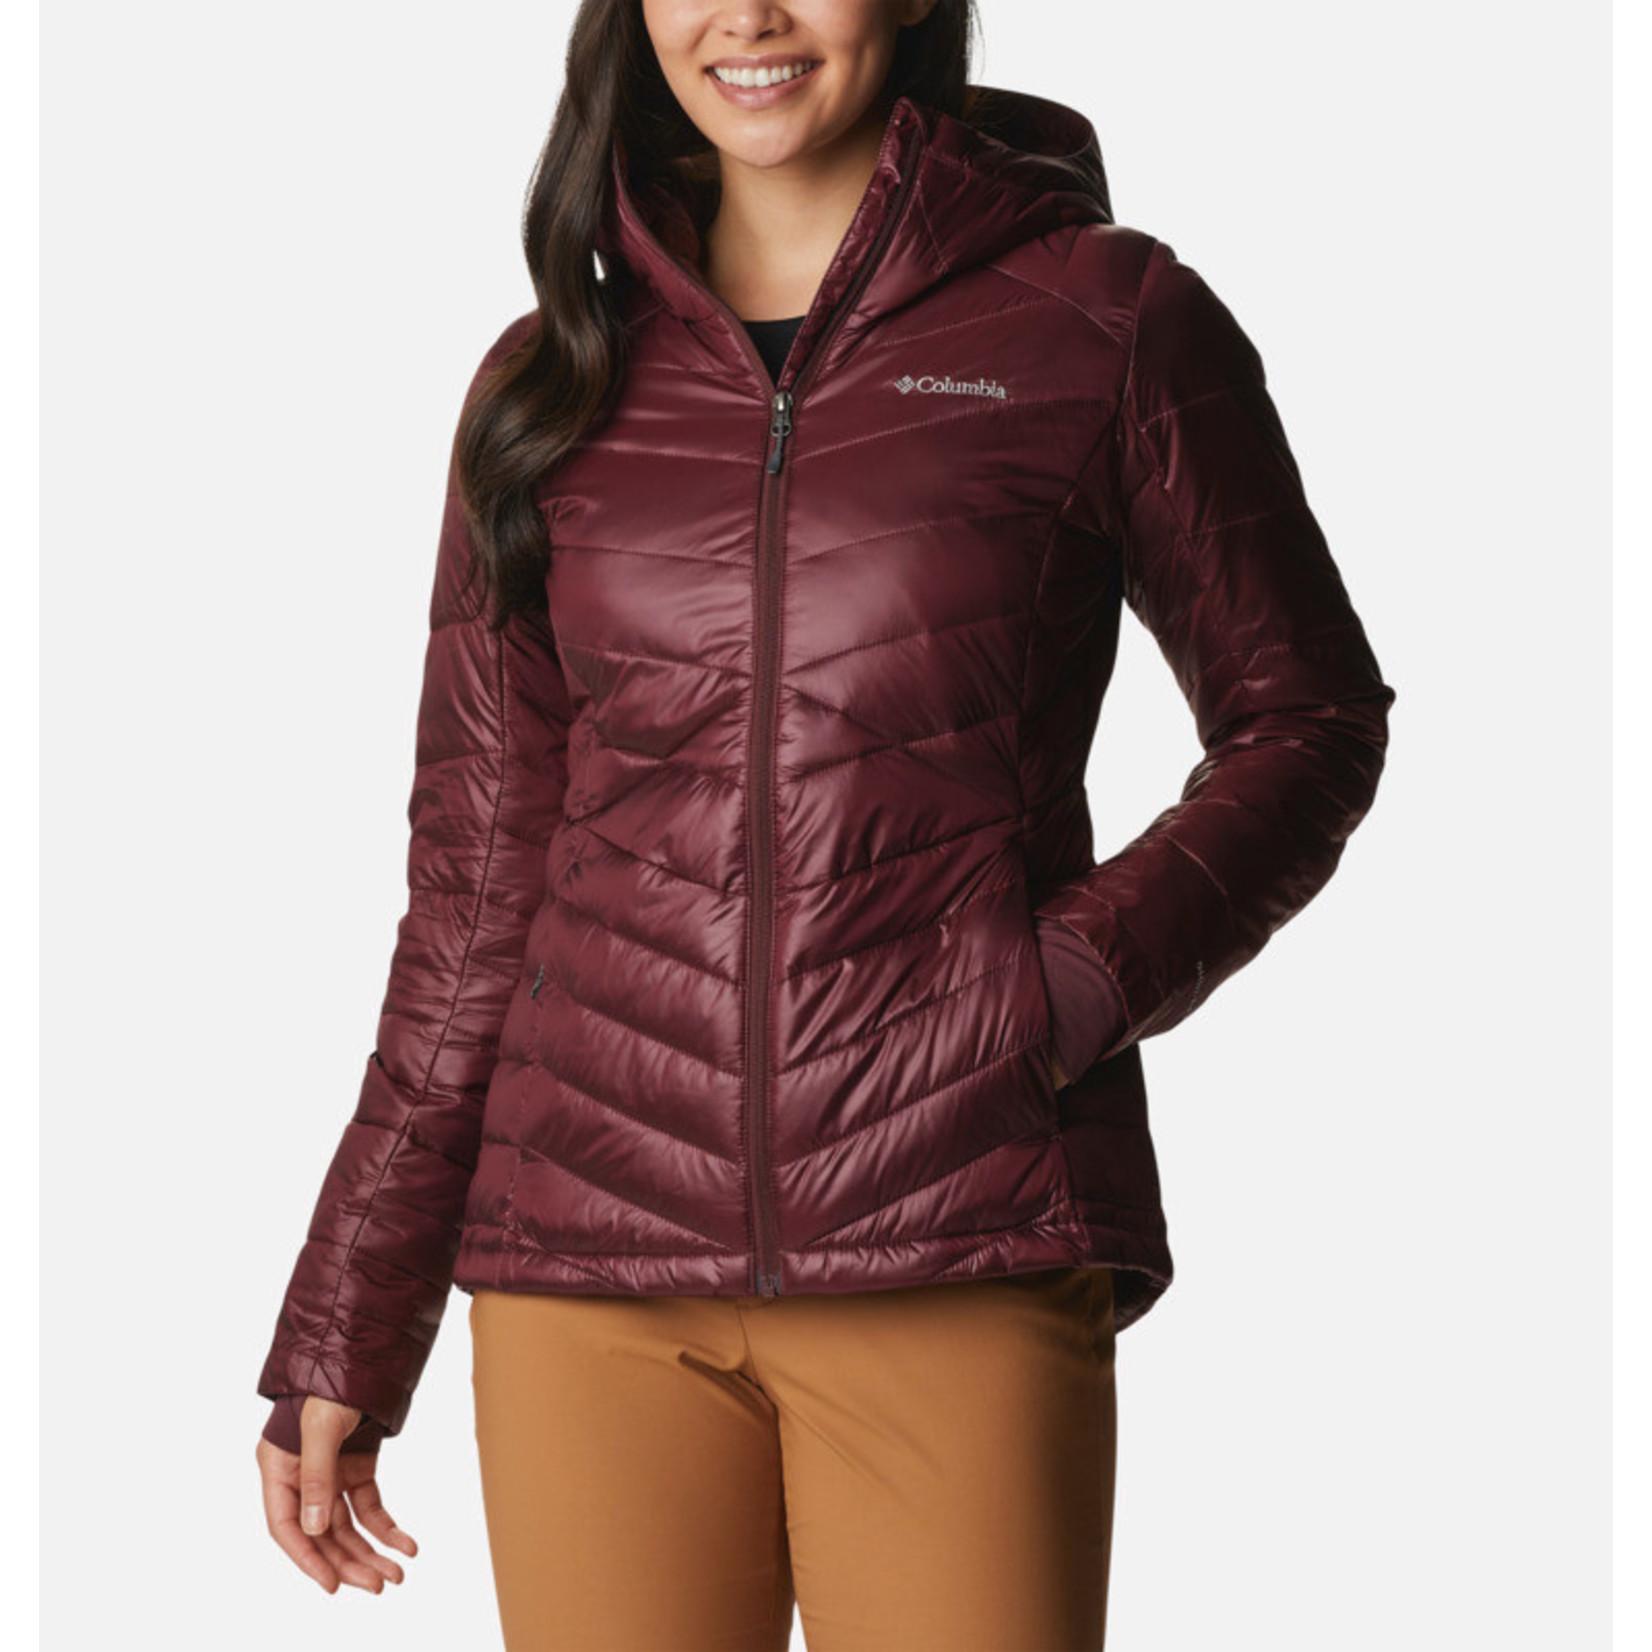 Columbia Columbia Winter Jacket, Joy Peak Hooded, Ladies